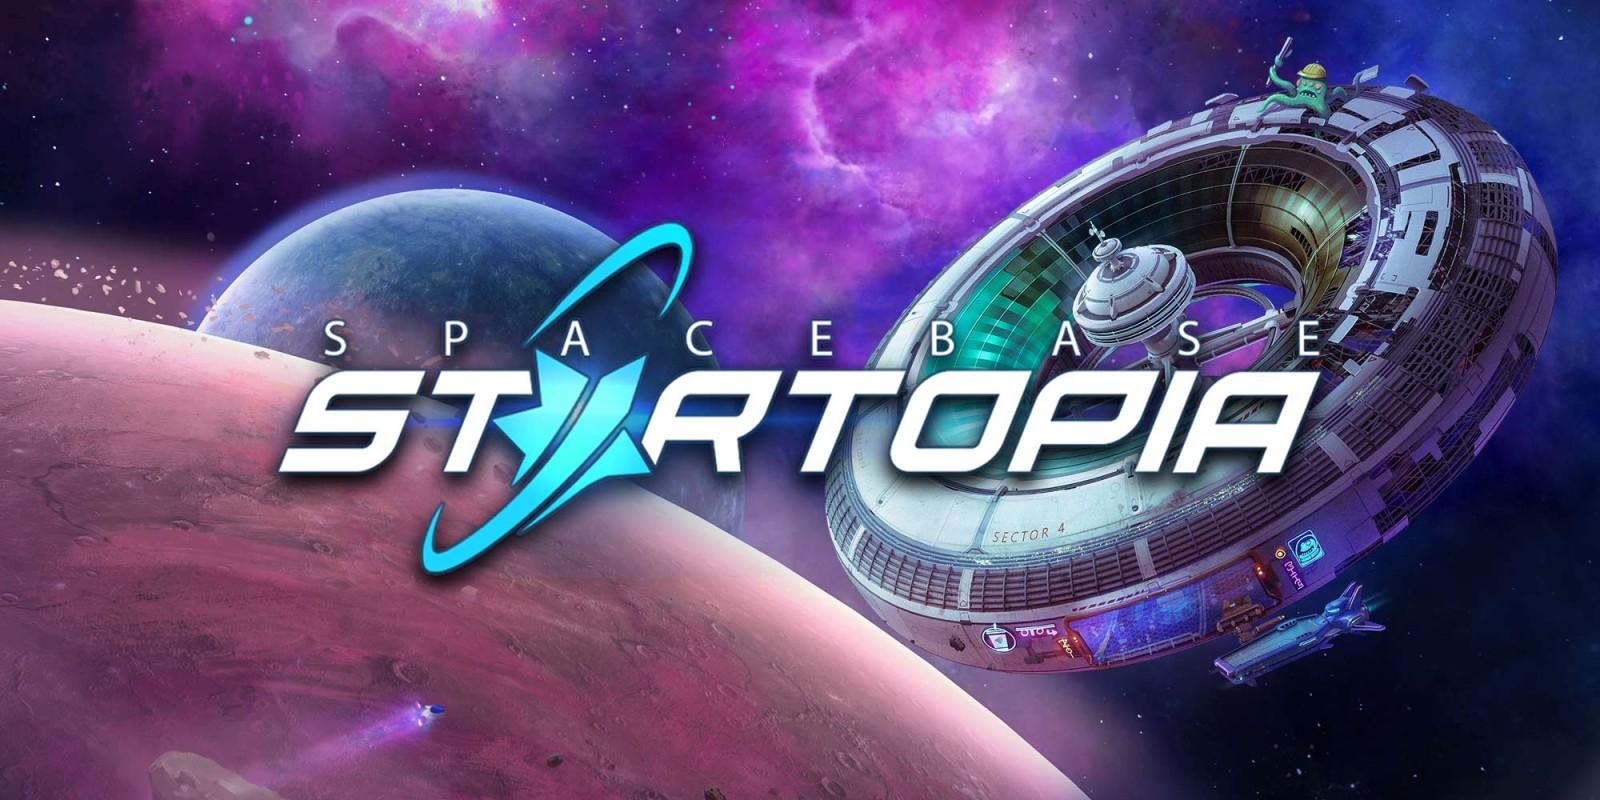 GALAXY TO GO: PRE-ORDERS BEGIN FOR SPACEBASE STARTOPIA ON NINTENDO SWITCH